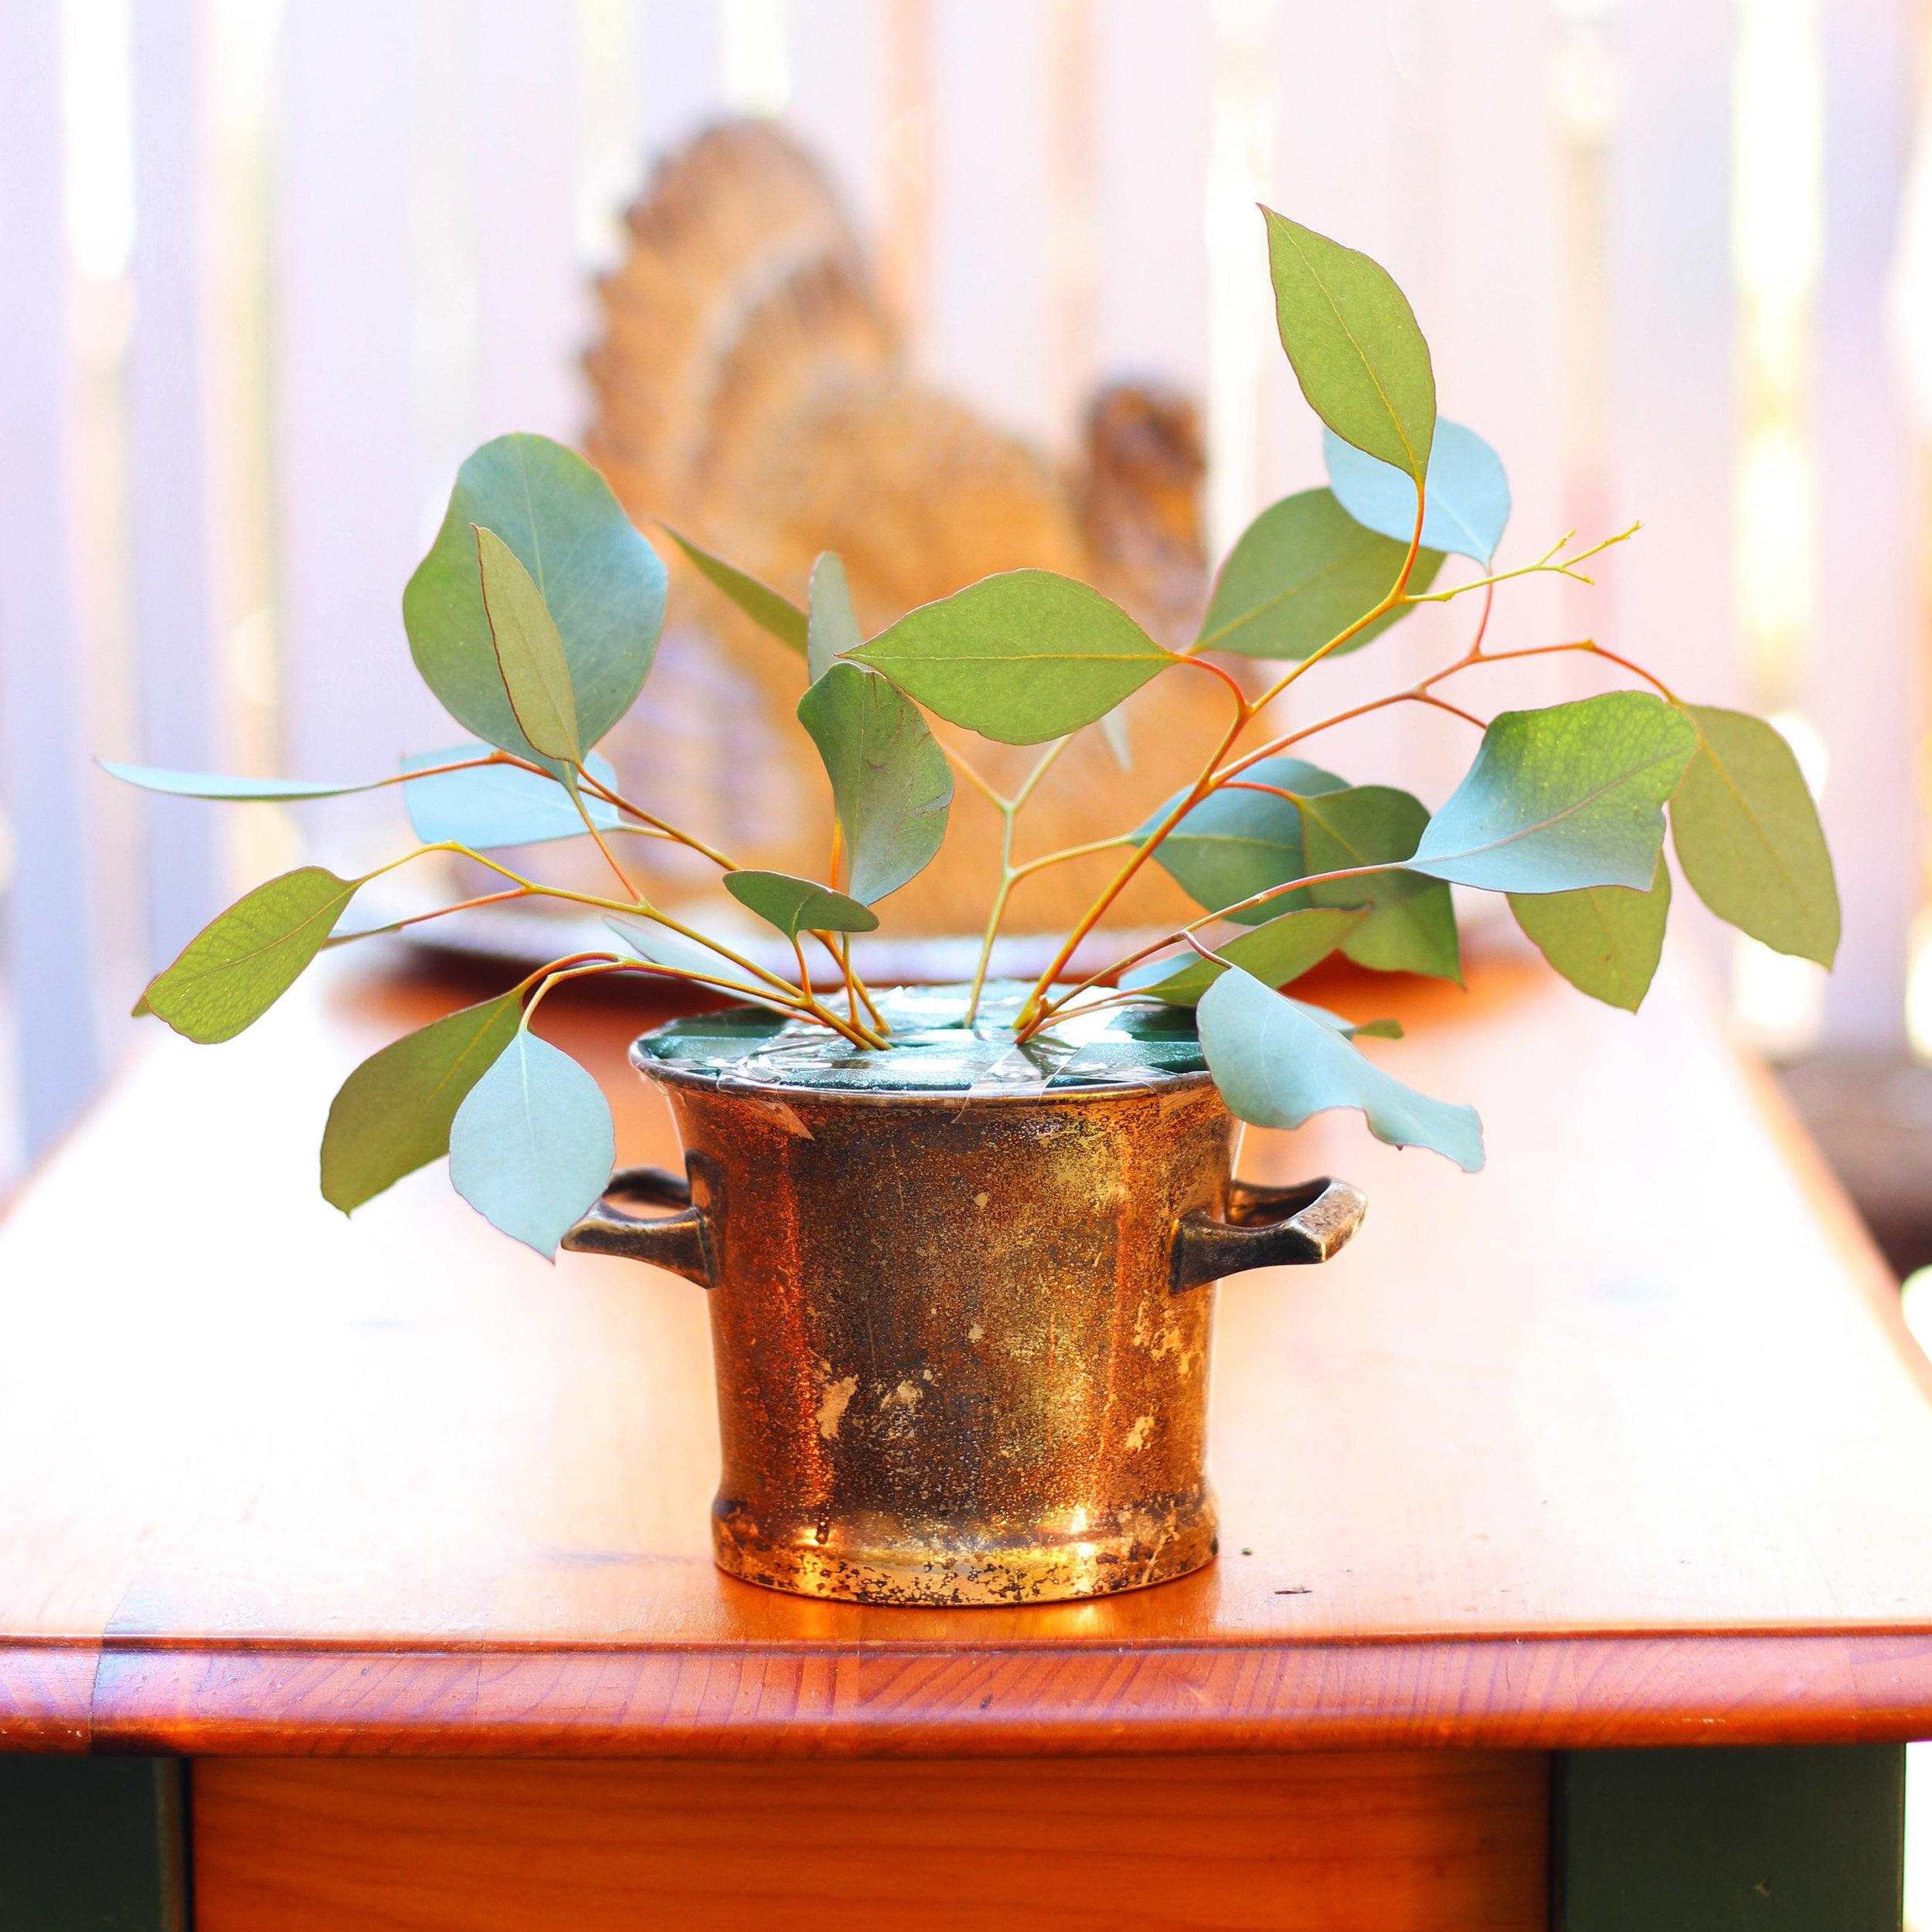 Insert half a dozen Eucalyptus leaves.